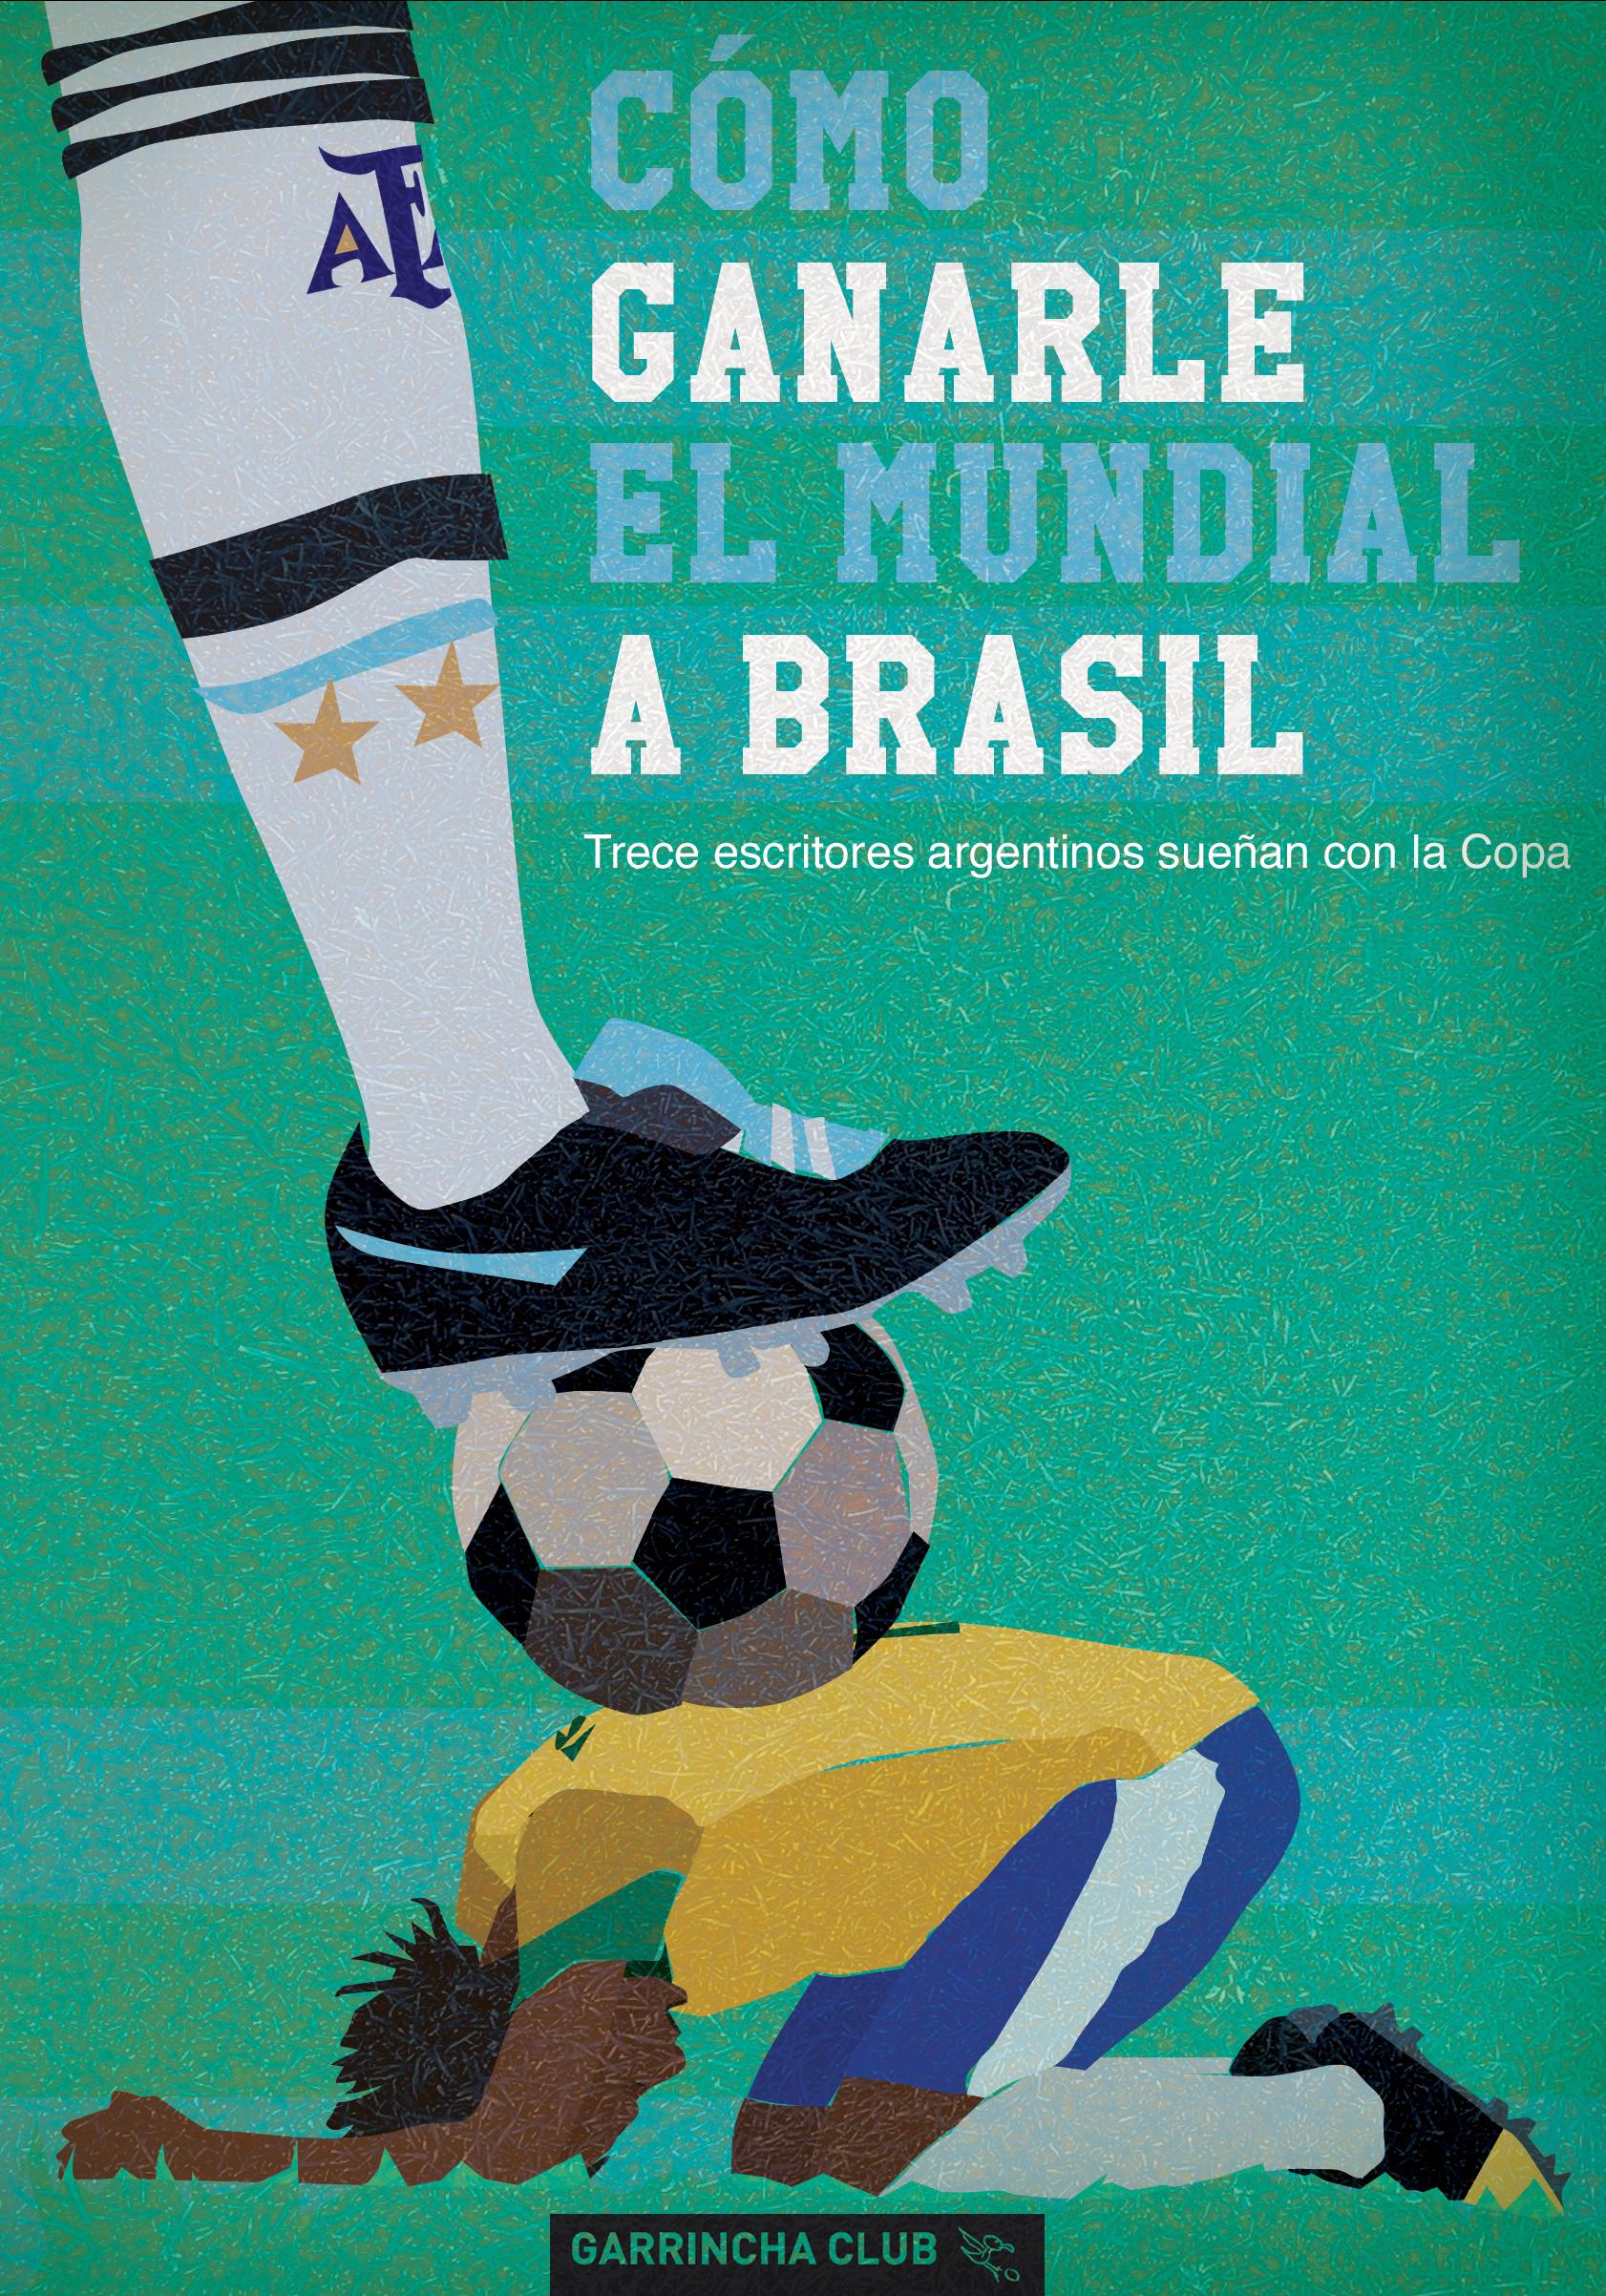 como ganarle el mundial a brasil op2 copy.jpg